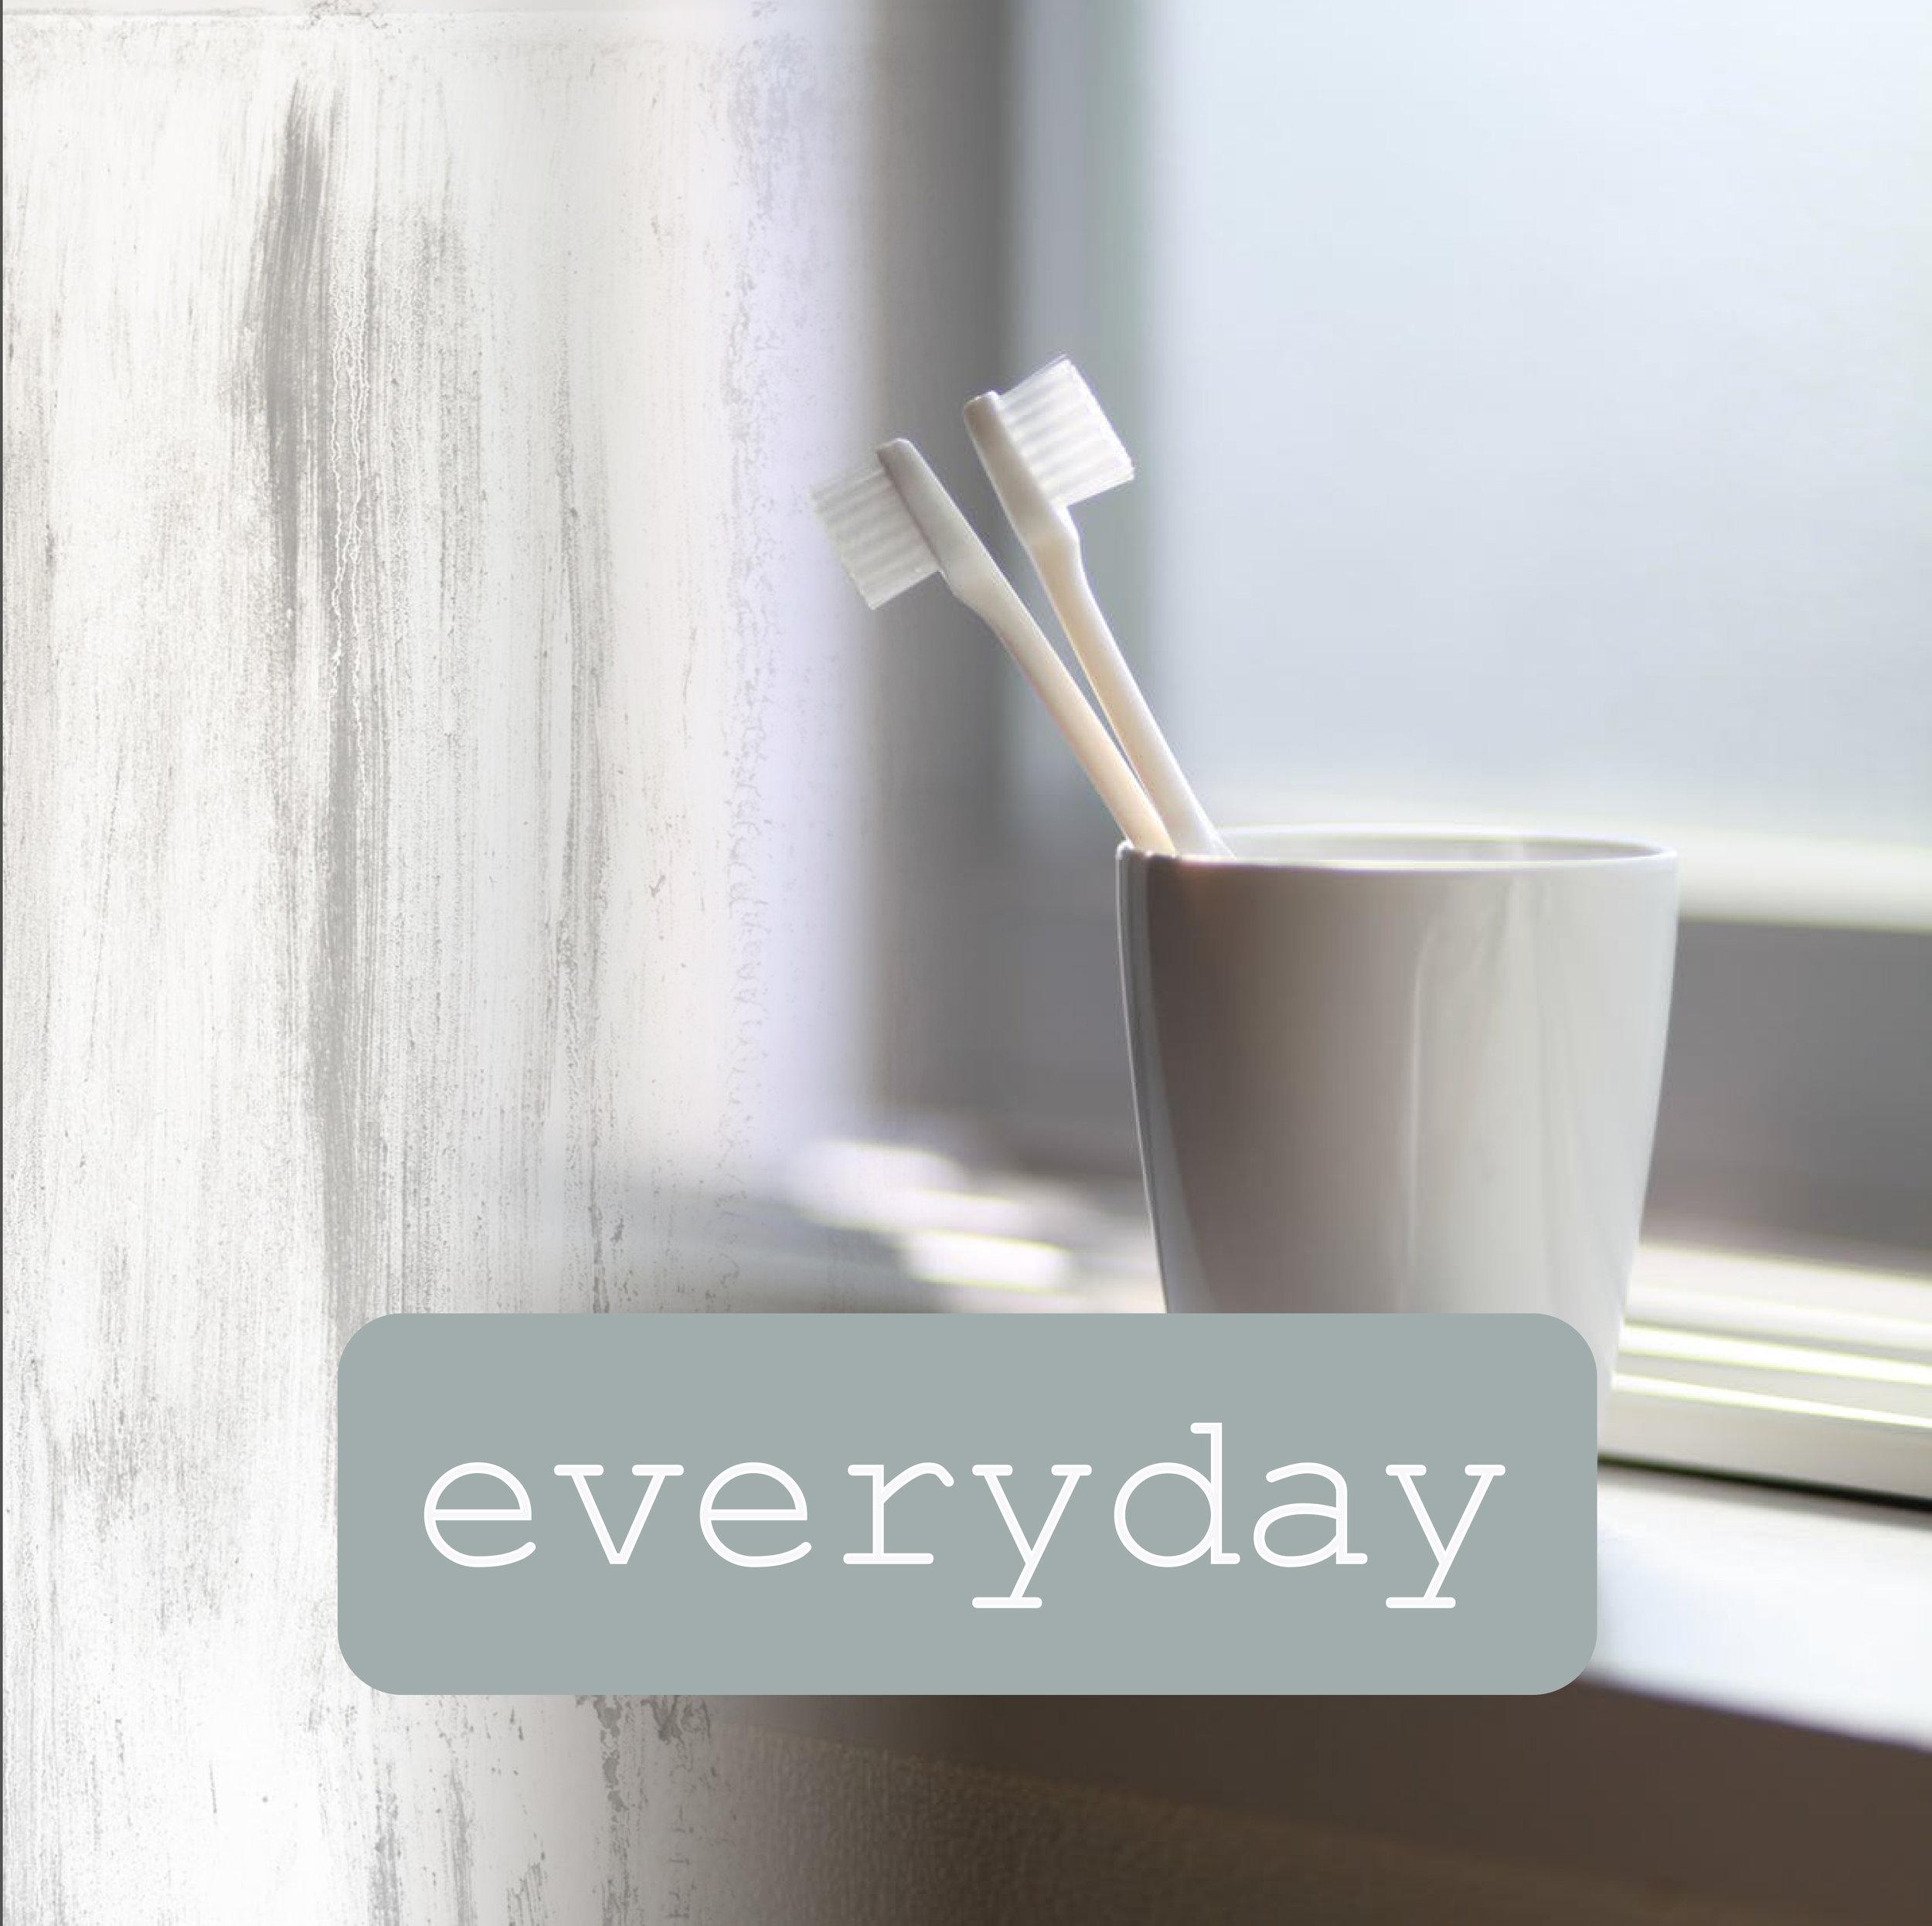 everyday square.jpg